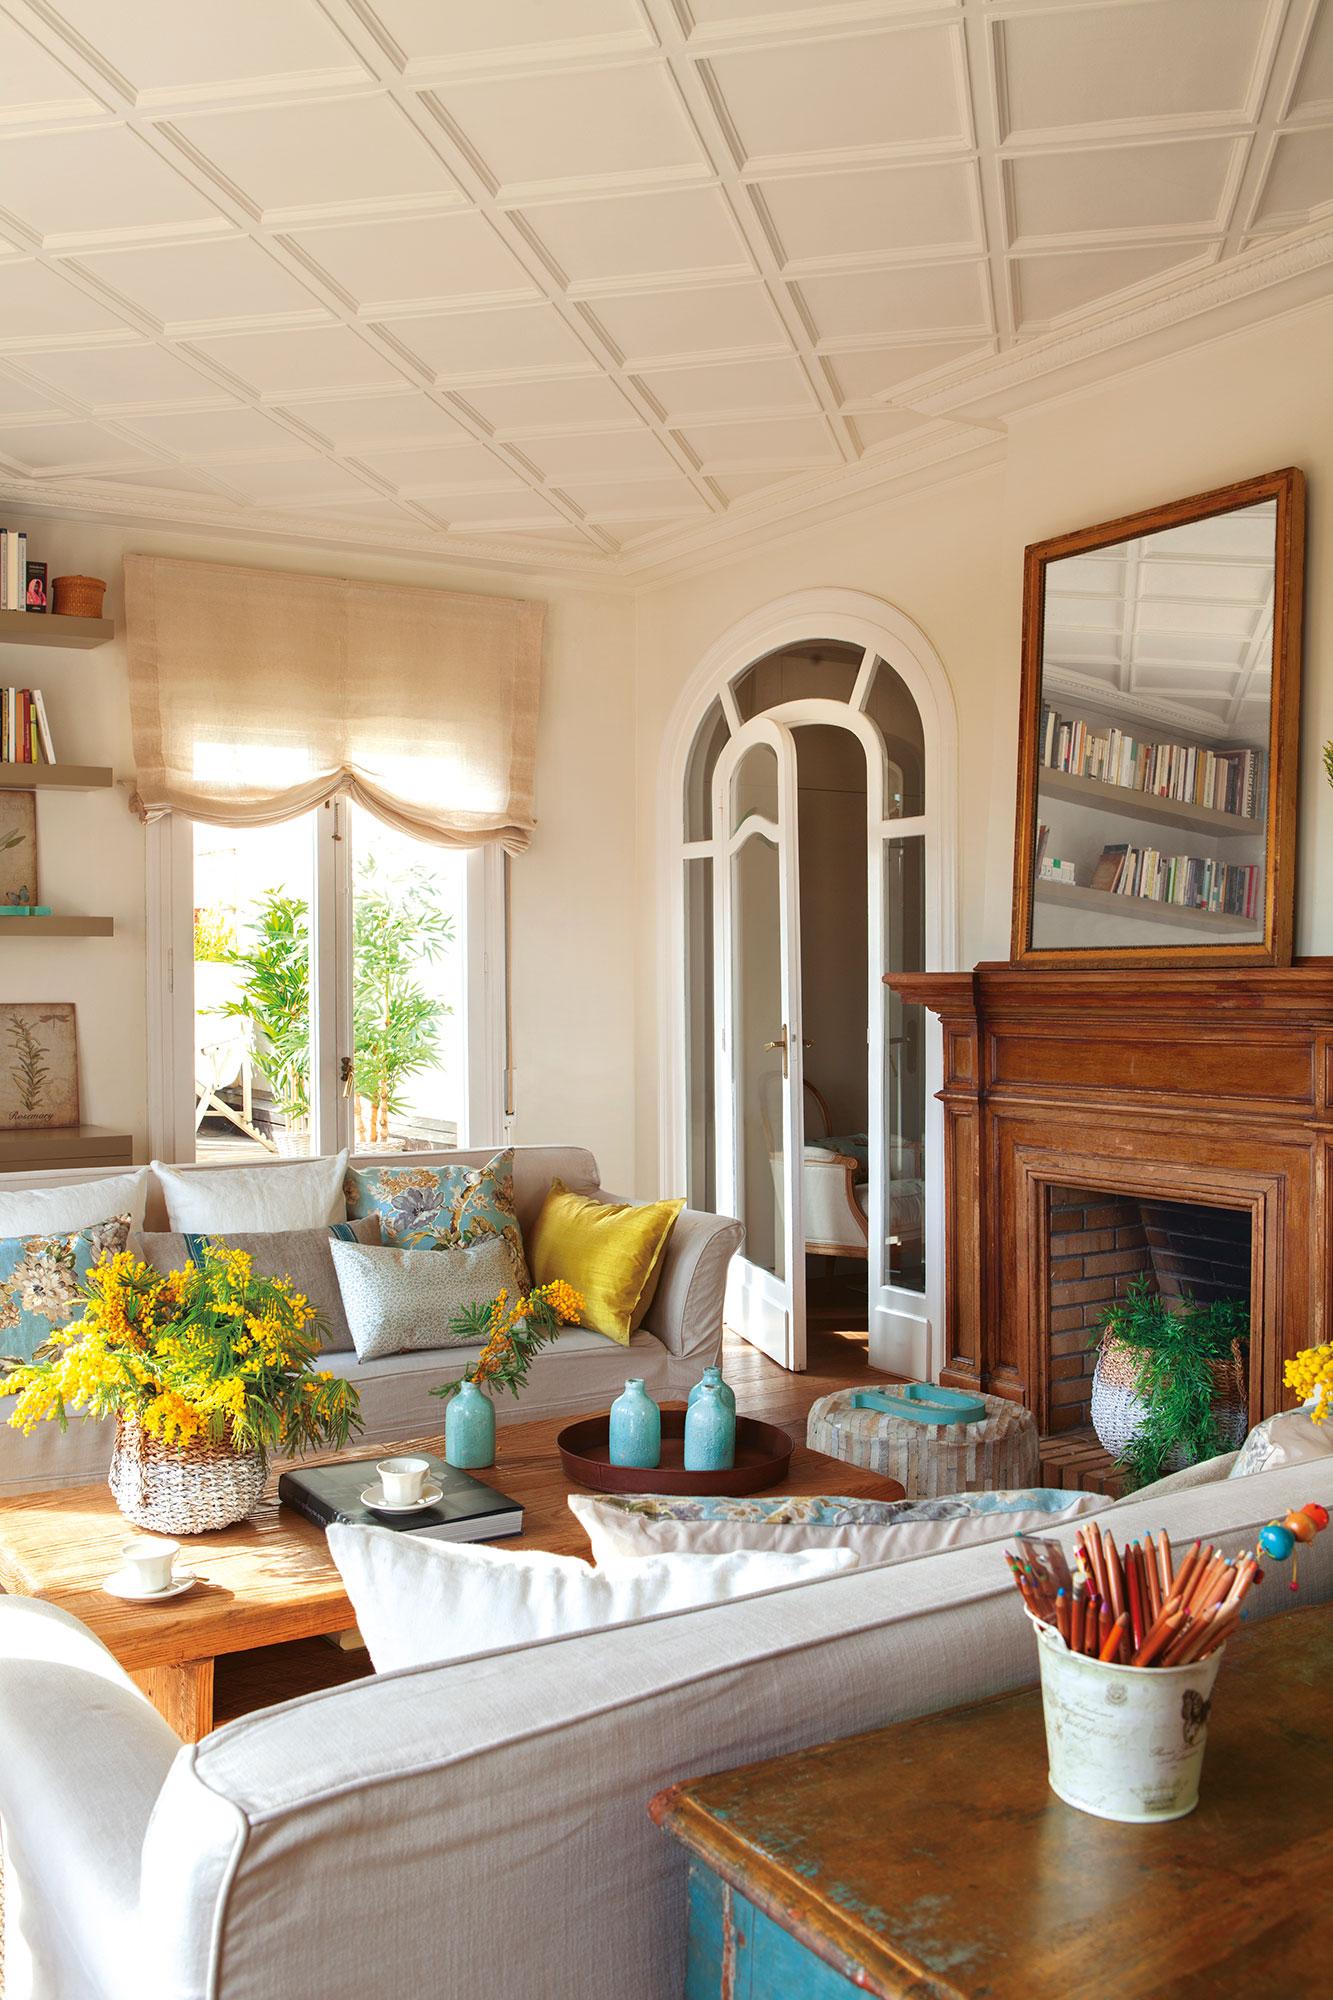 4 salones ideales ideas de decoradora para tener un sal n - Salon con chimenea ...